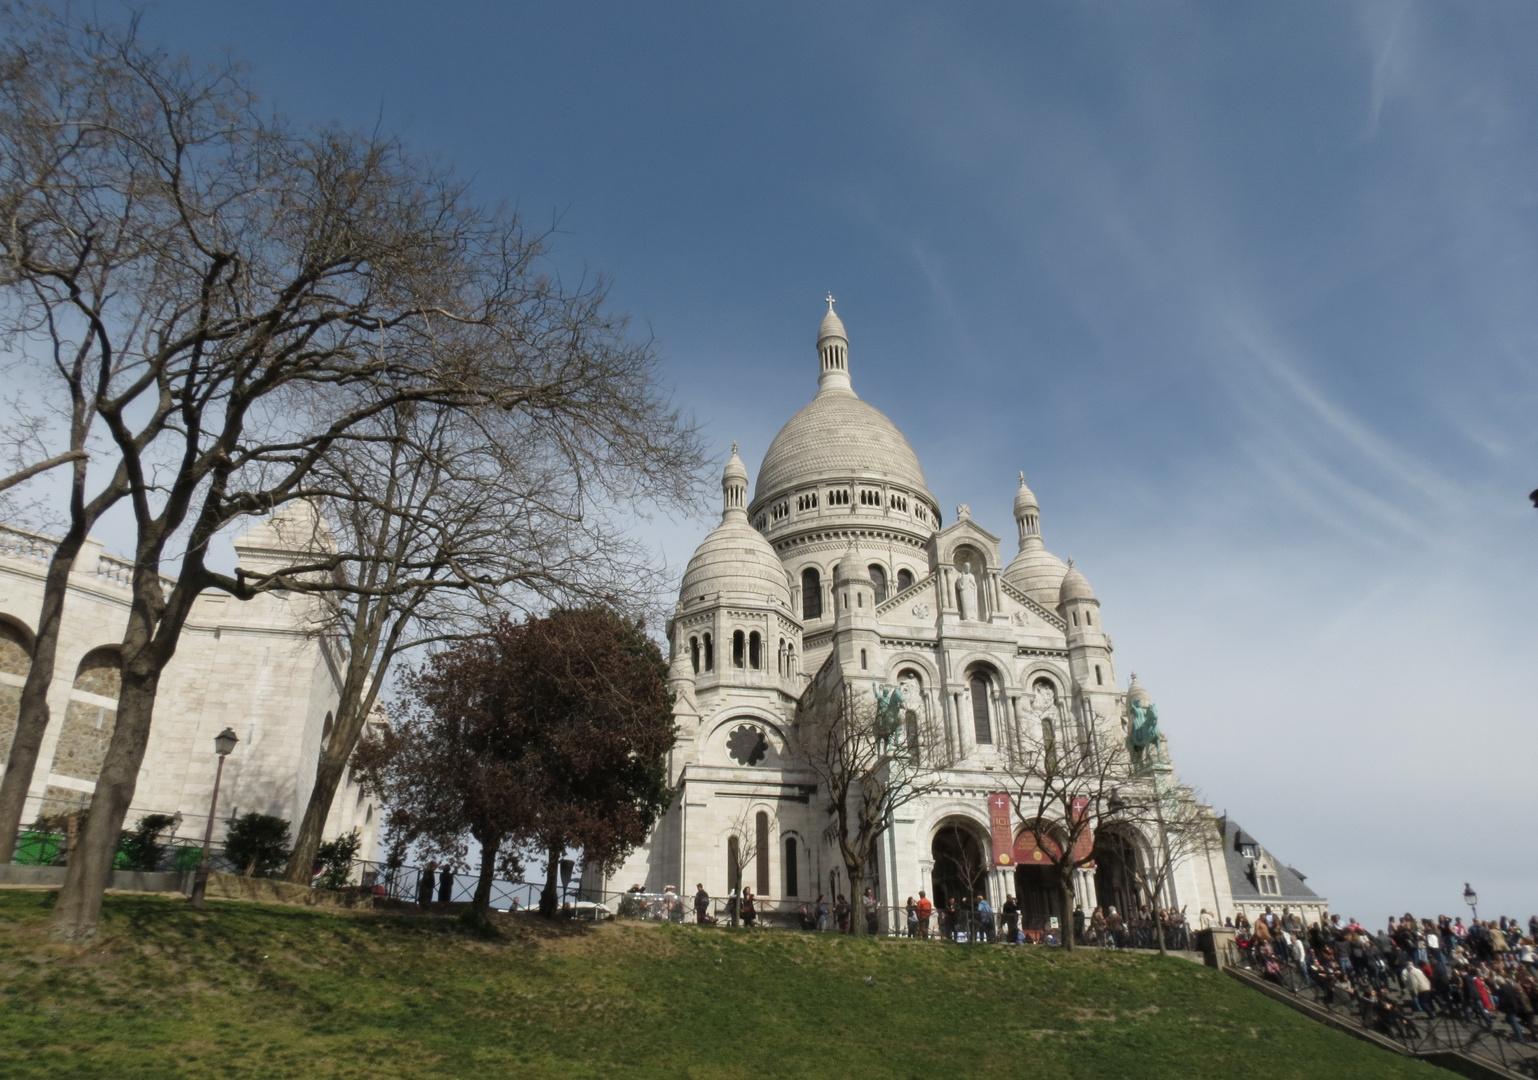 Die Basilika Sacré-Cœur auf dem Montmartre